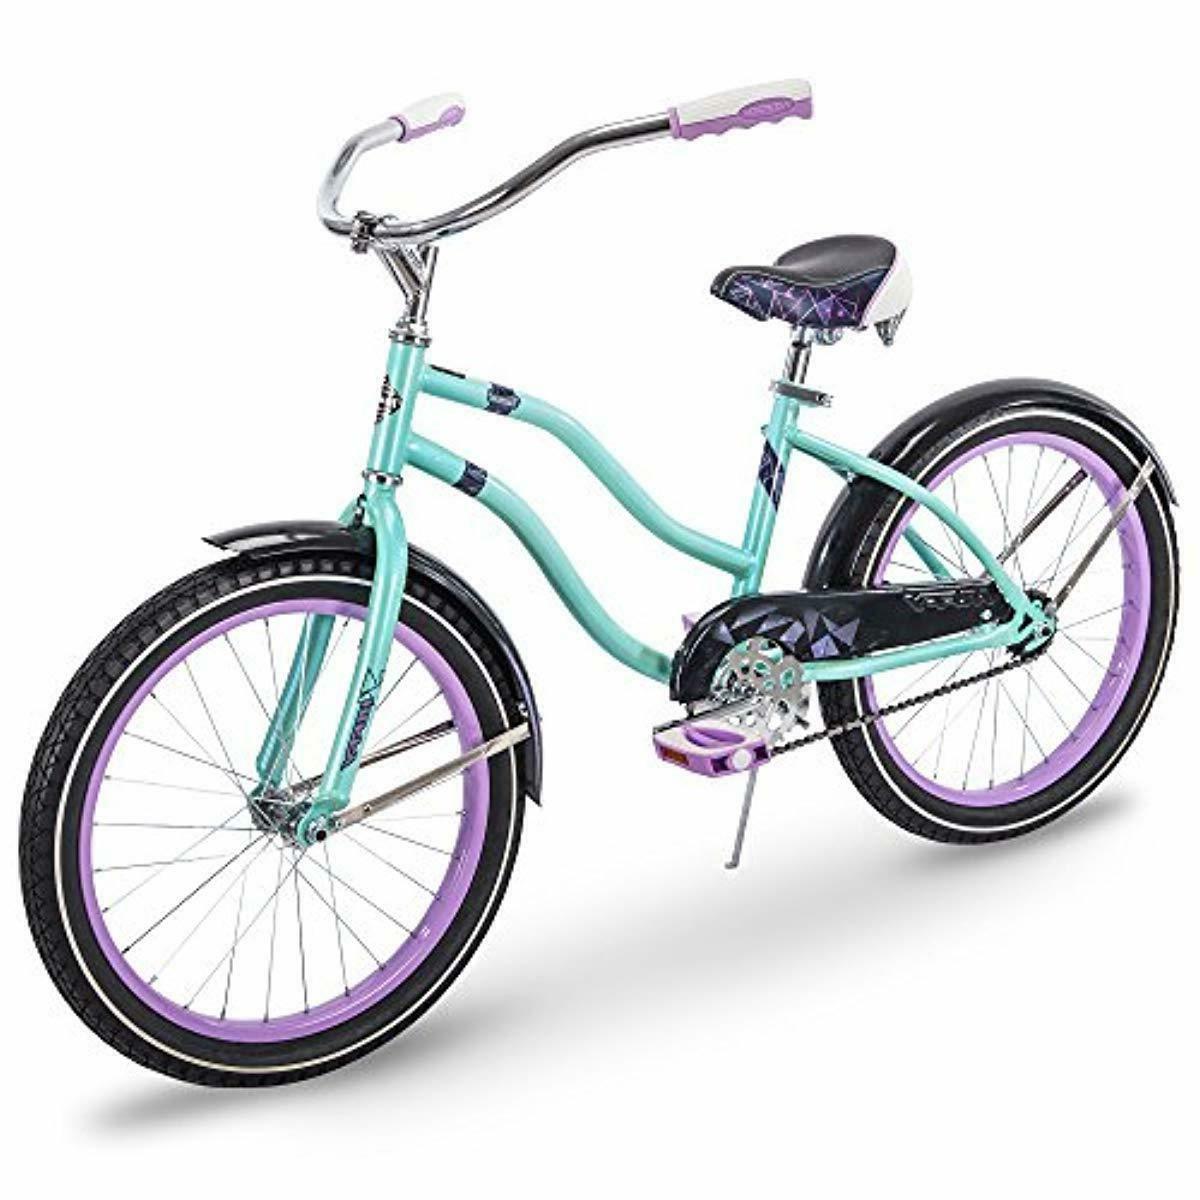 huffy bicycle company huffy kids cruiser bike